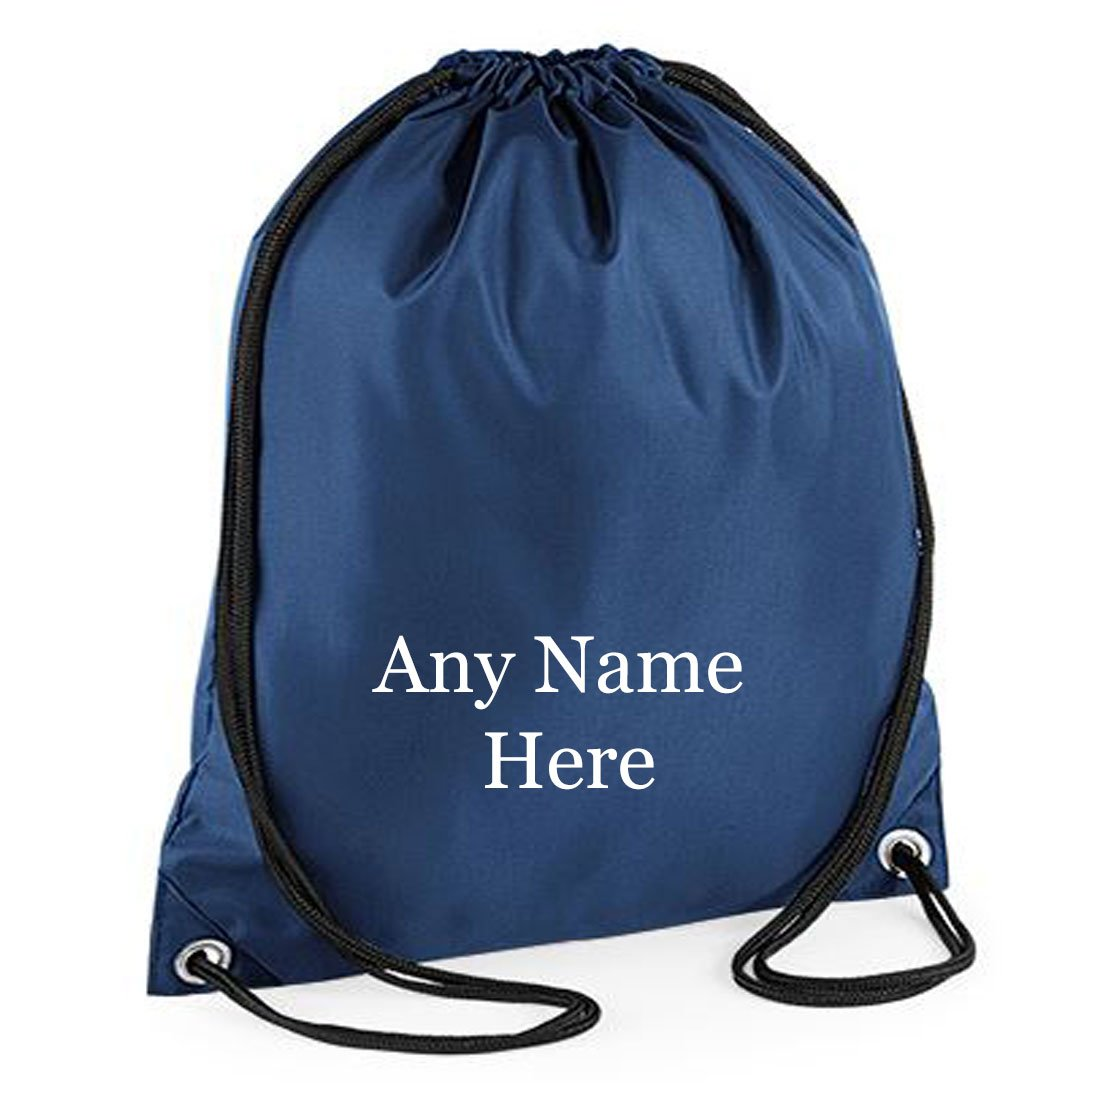 PERSONALISED POLYESTER DRAWSTRING BAG PE GYM SWIM BOYS GIRLS CUSTOM NAME NEW